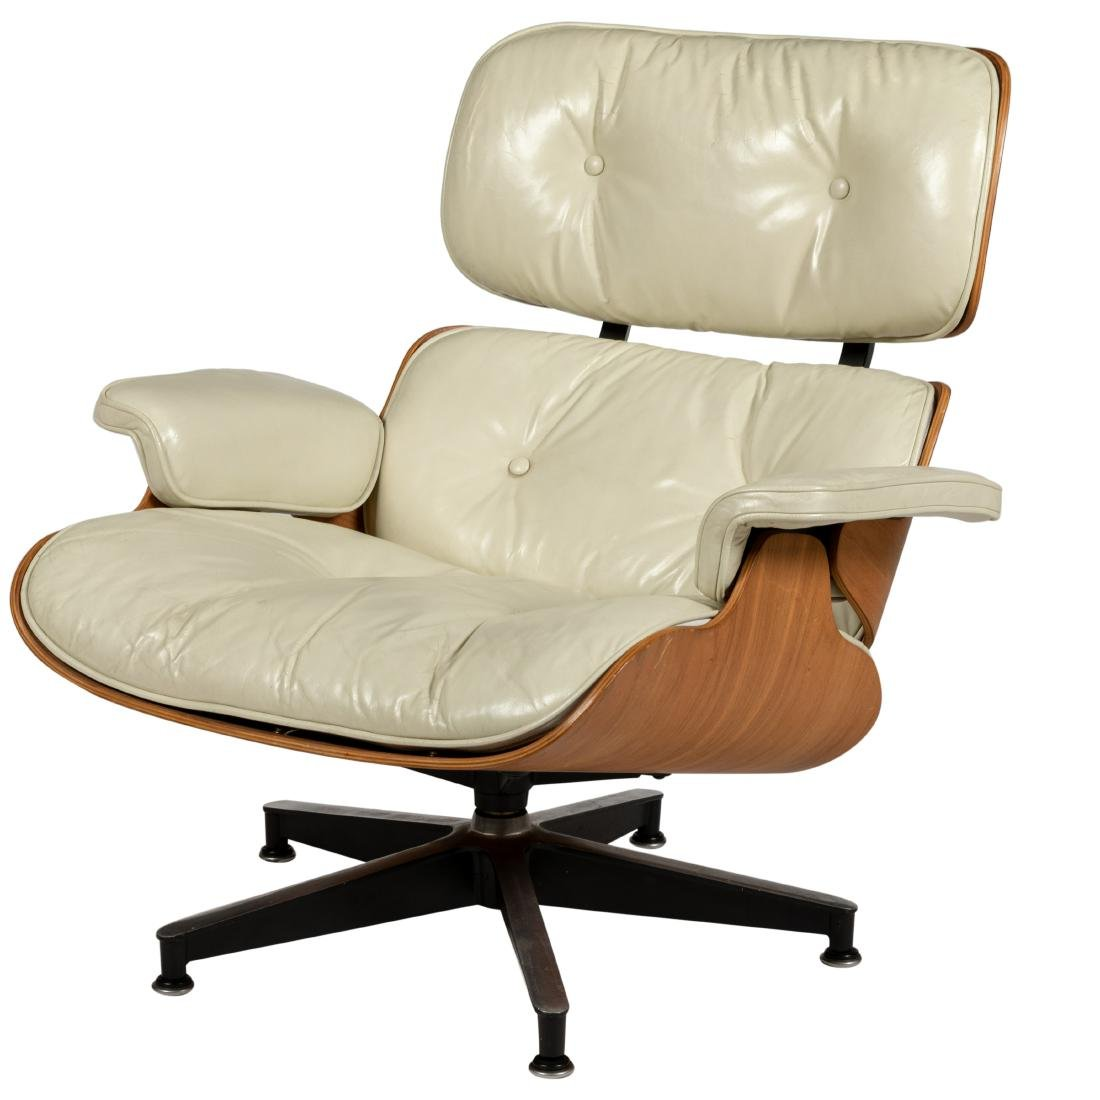 Charles U0026 Ray Eames   670 Lounge Chair